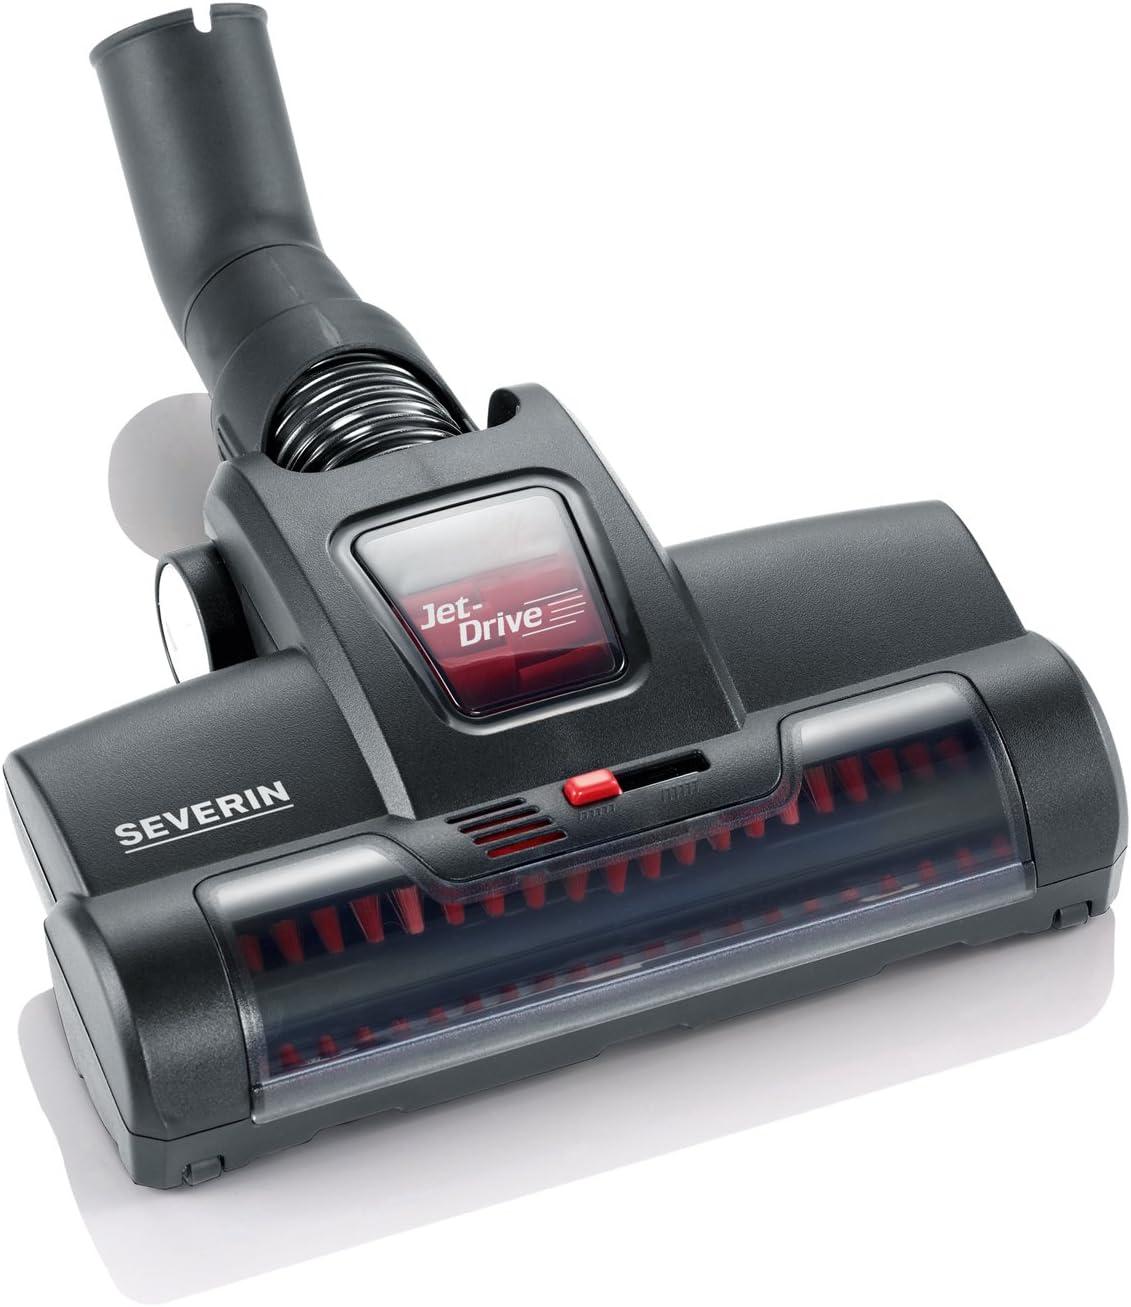 Severin Floorcare Turbo Brush for Vacuum Cleaners (JET)